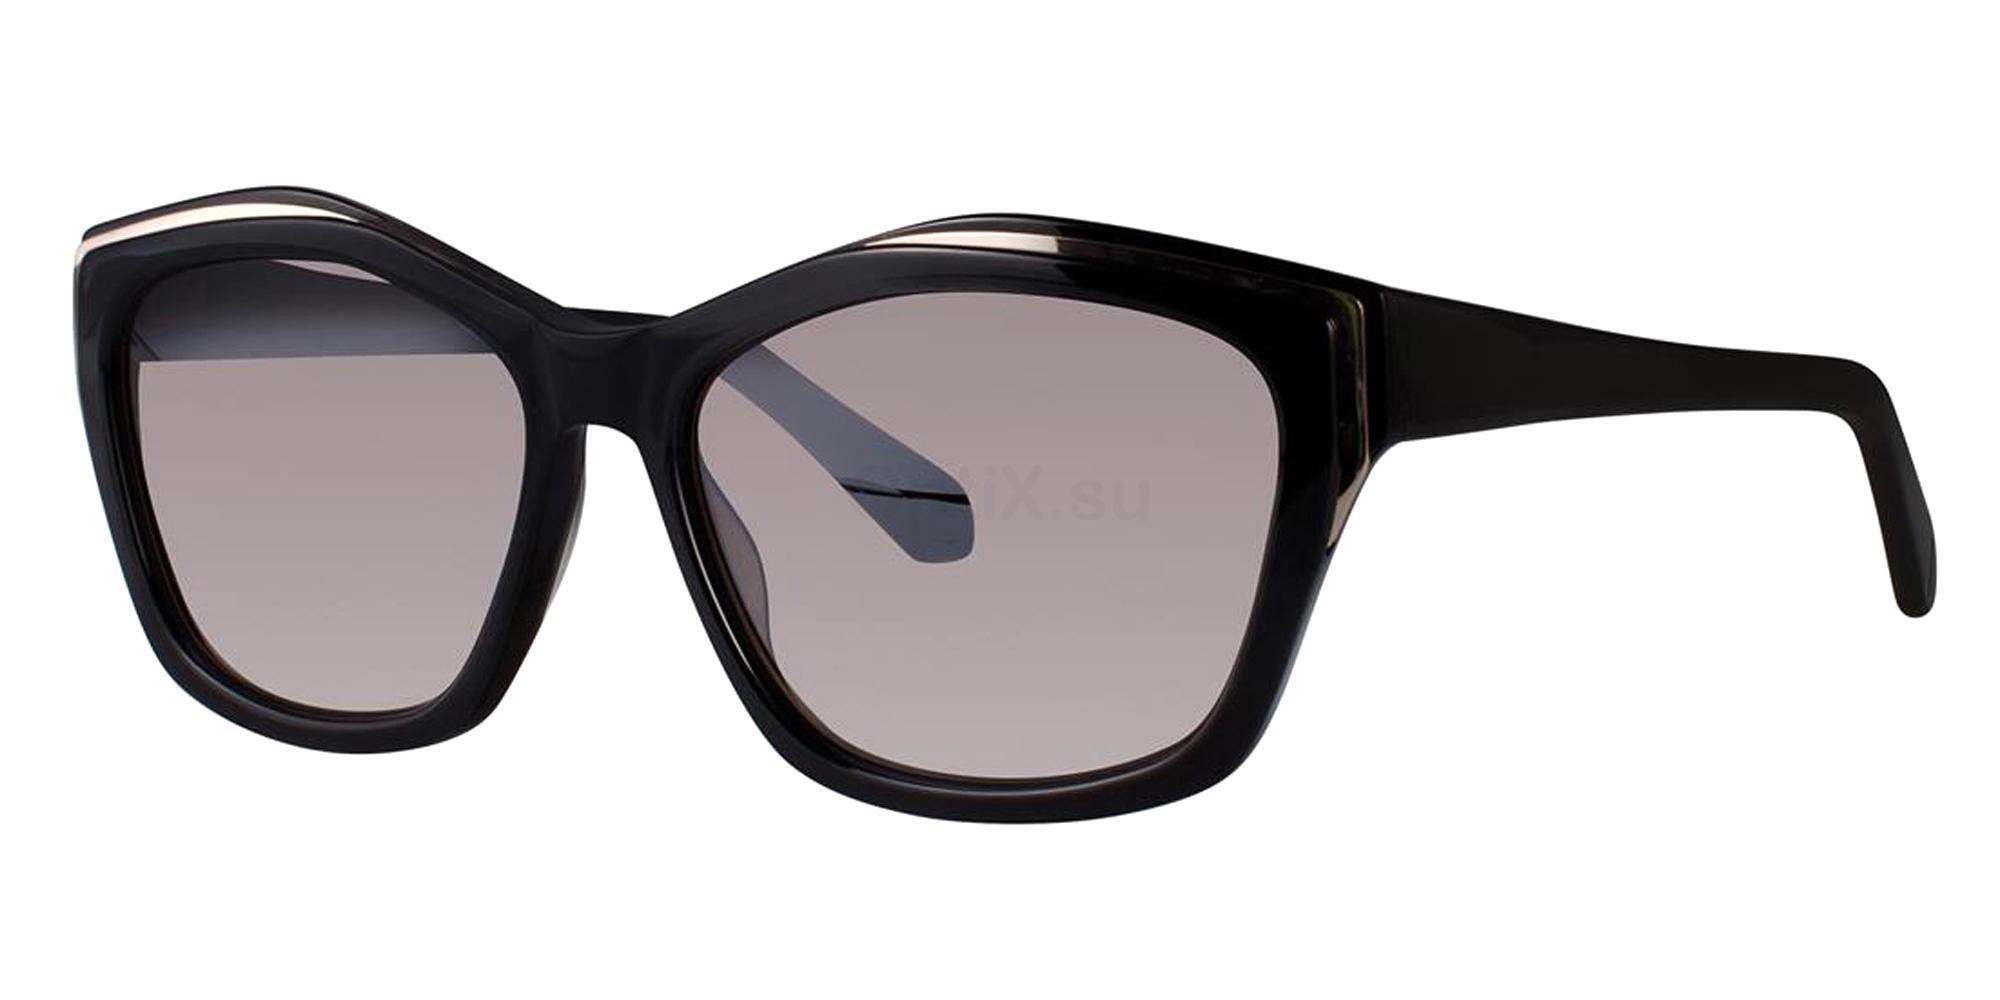 Black RUTHIE Sunglasses, Zac Posen